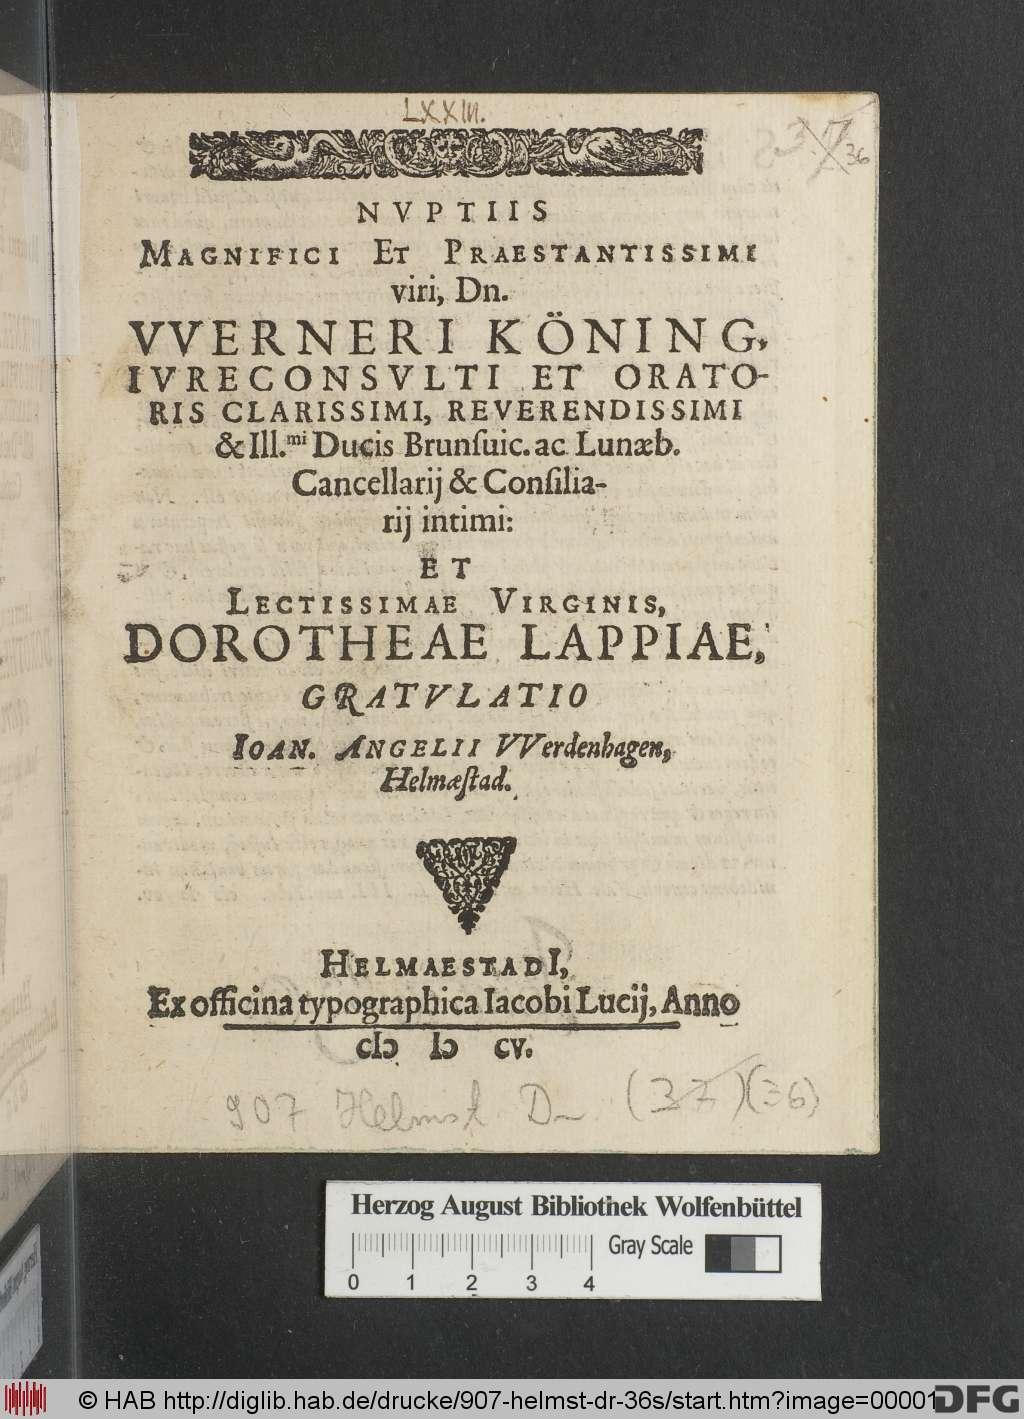 https://diglib.hab.de/drucke/907-helmst-dr-36s/00001.jpg